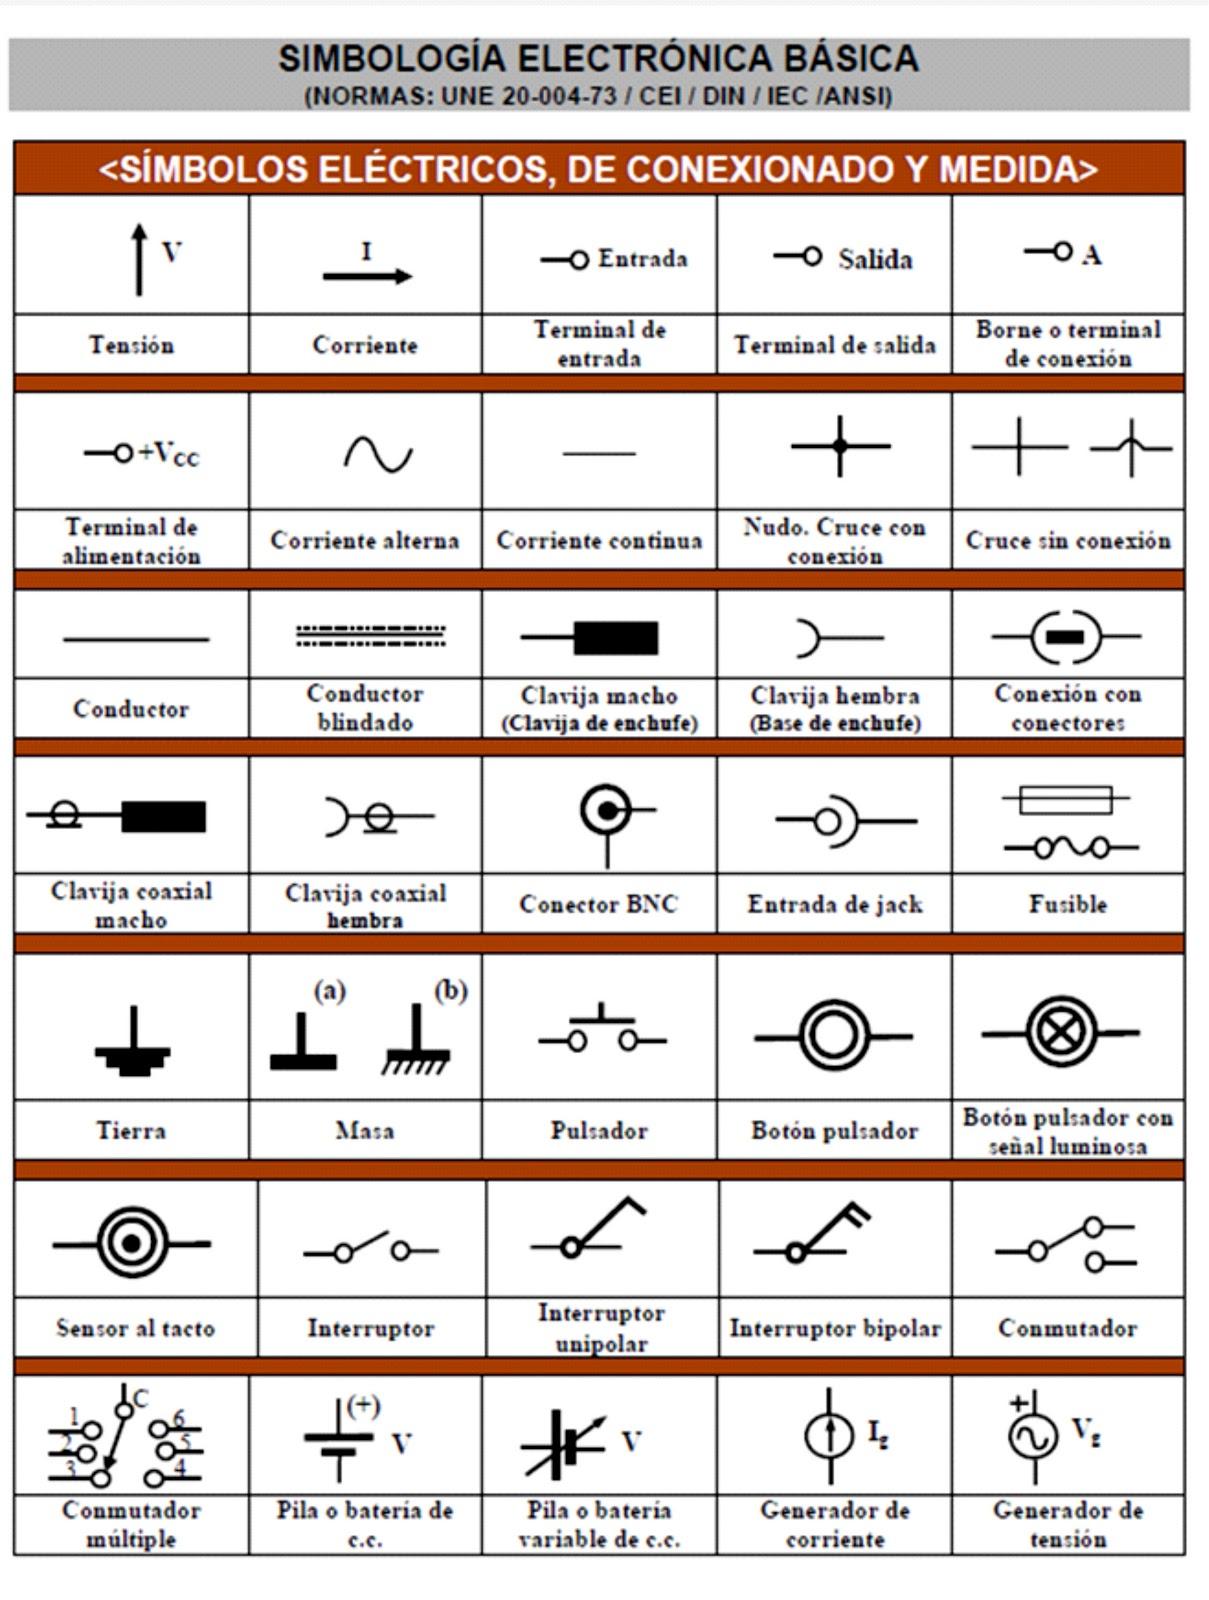 Multimetro digital simbolos electronicos basicos for Arquitectura basica pdf